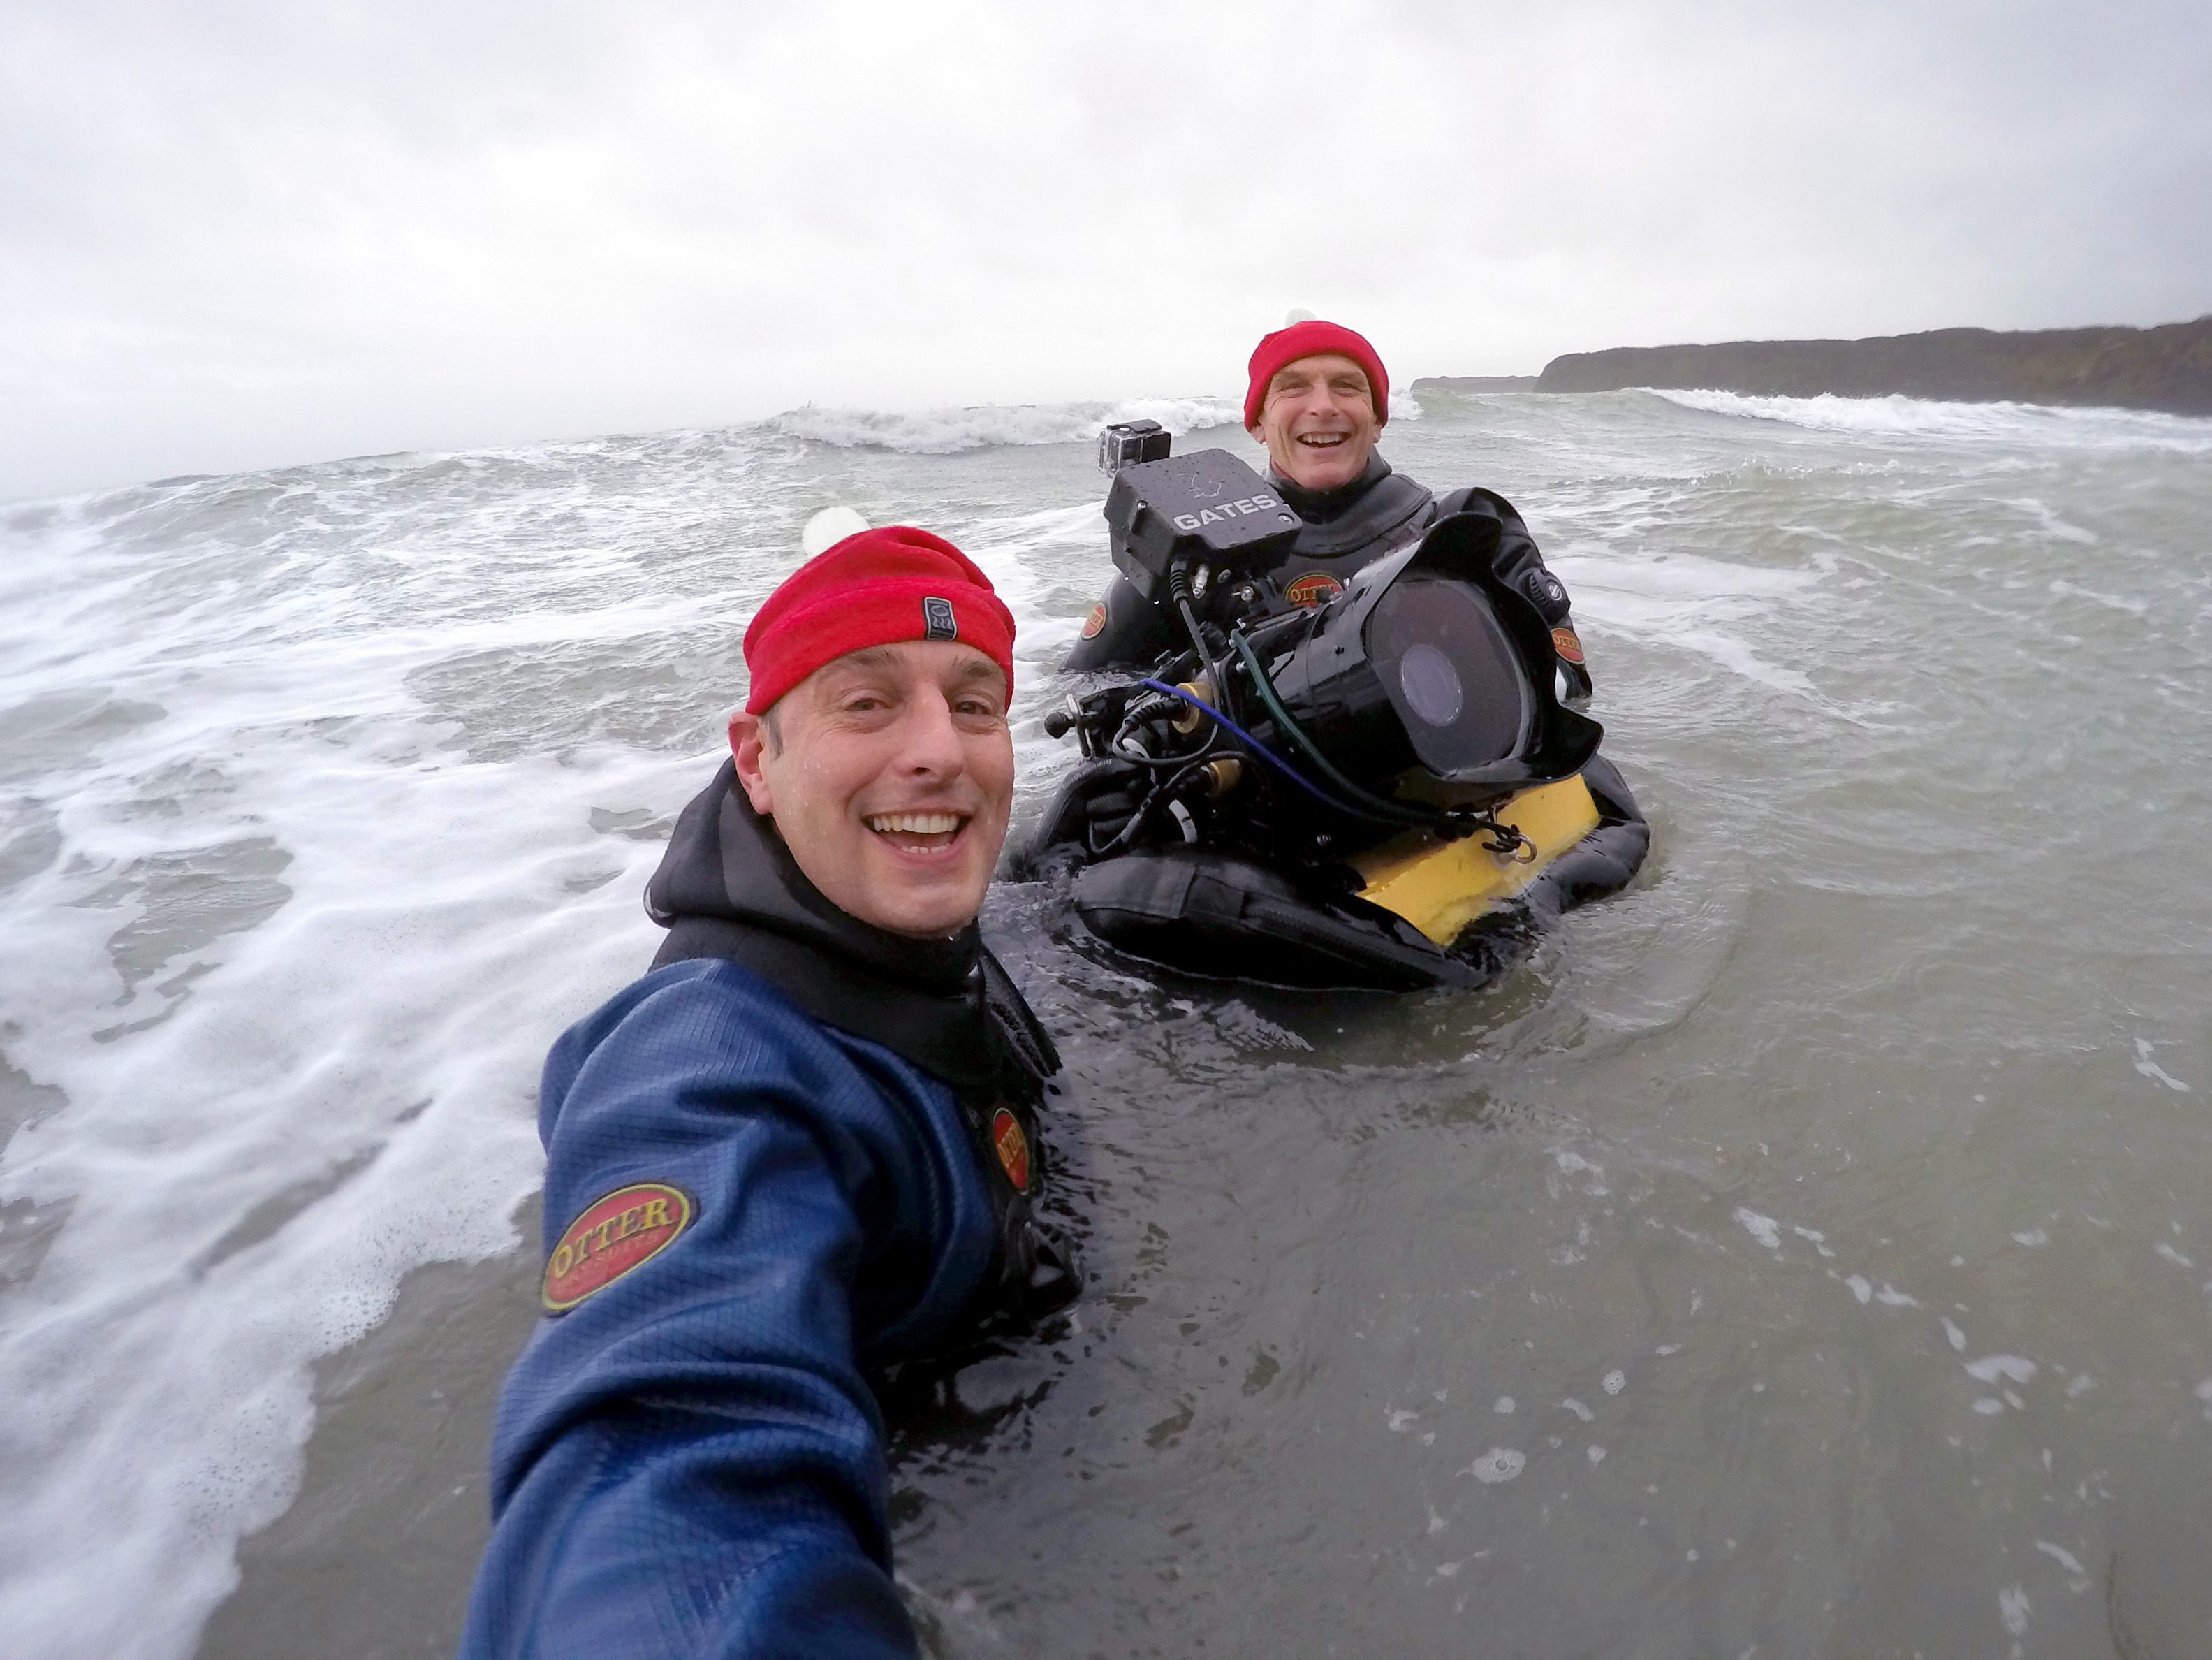 Underwater filming - specialist equipment